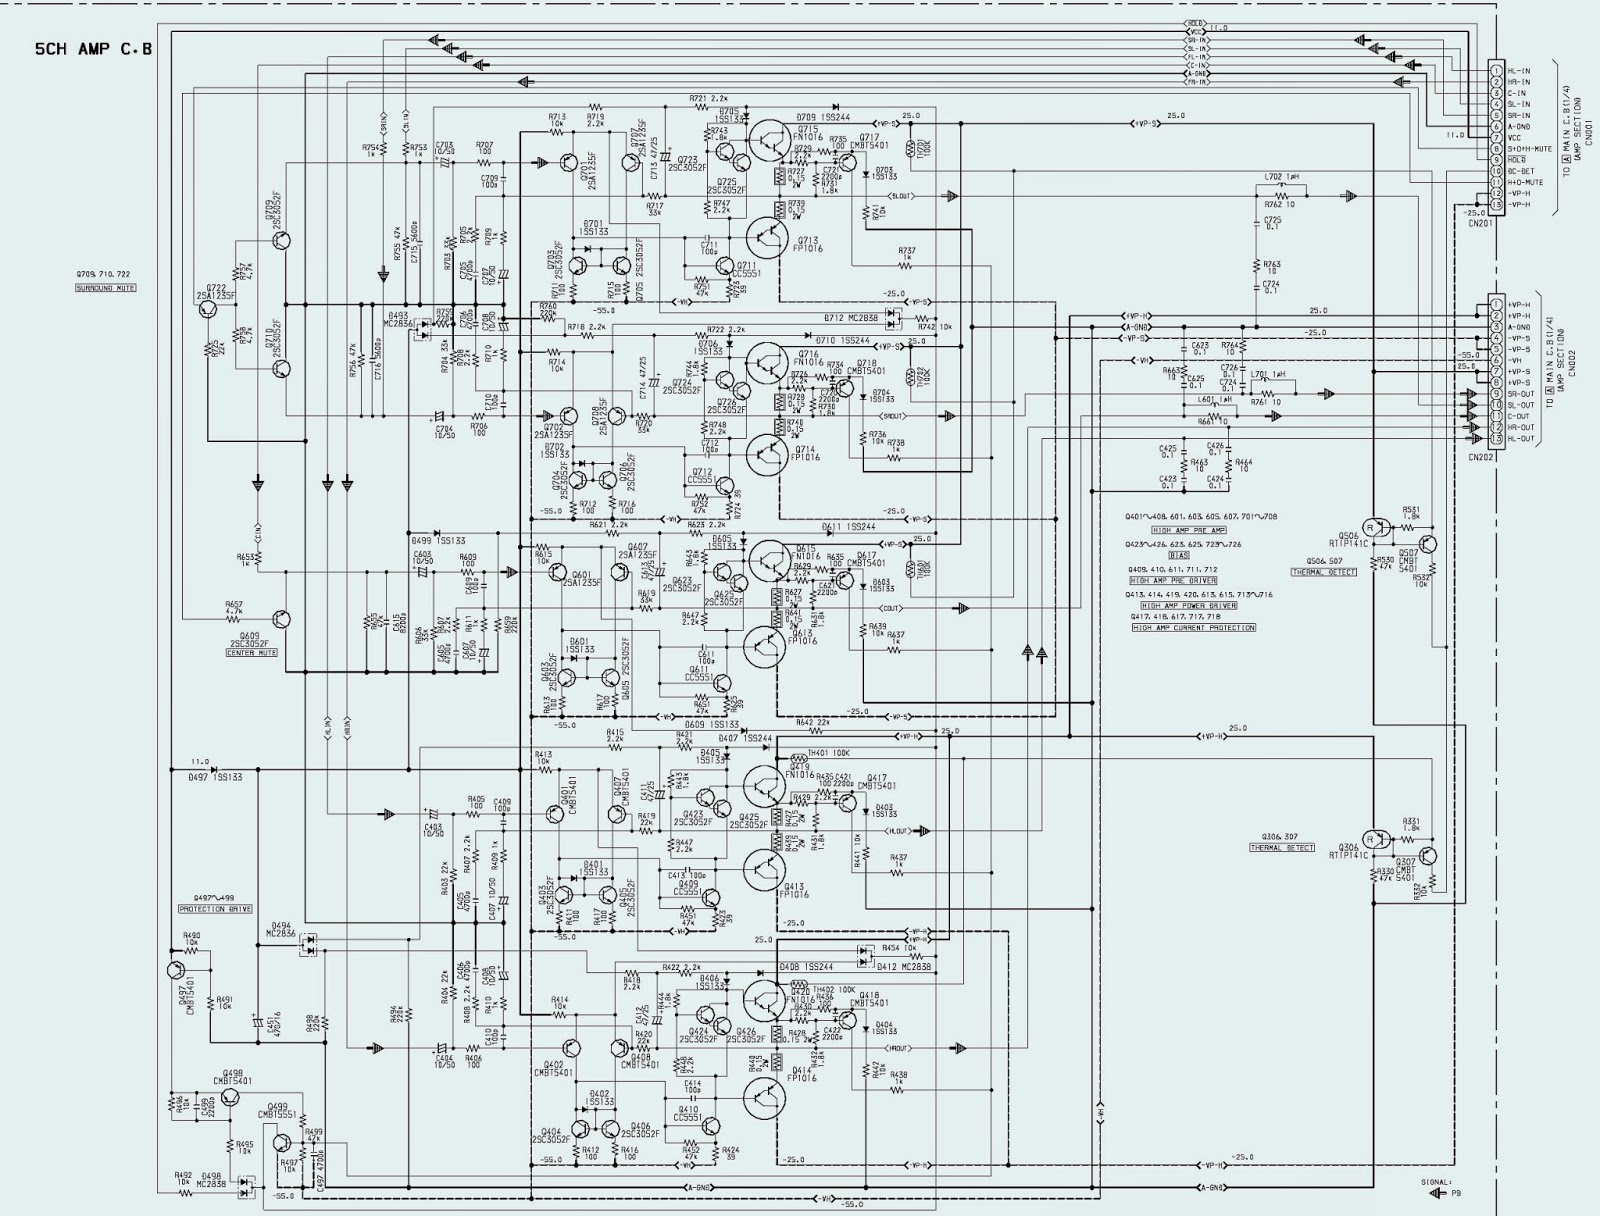 aiwa radio wiring diagram electrical wiring diagramxh stereo wiring diagram 21 [ 1600 x 1216 Pixel ]